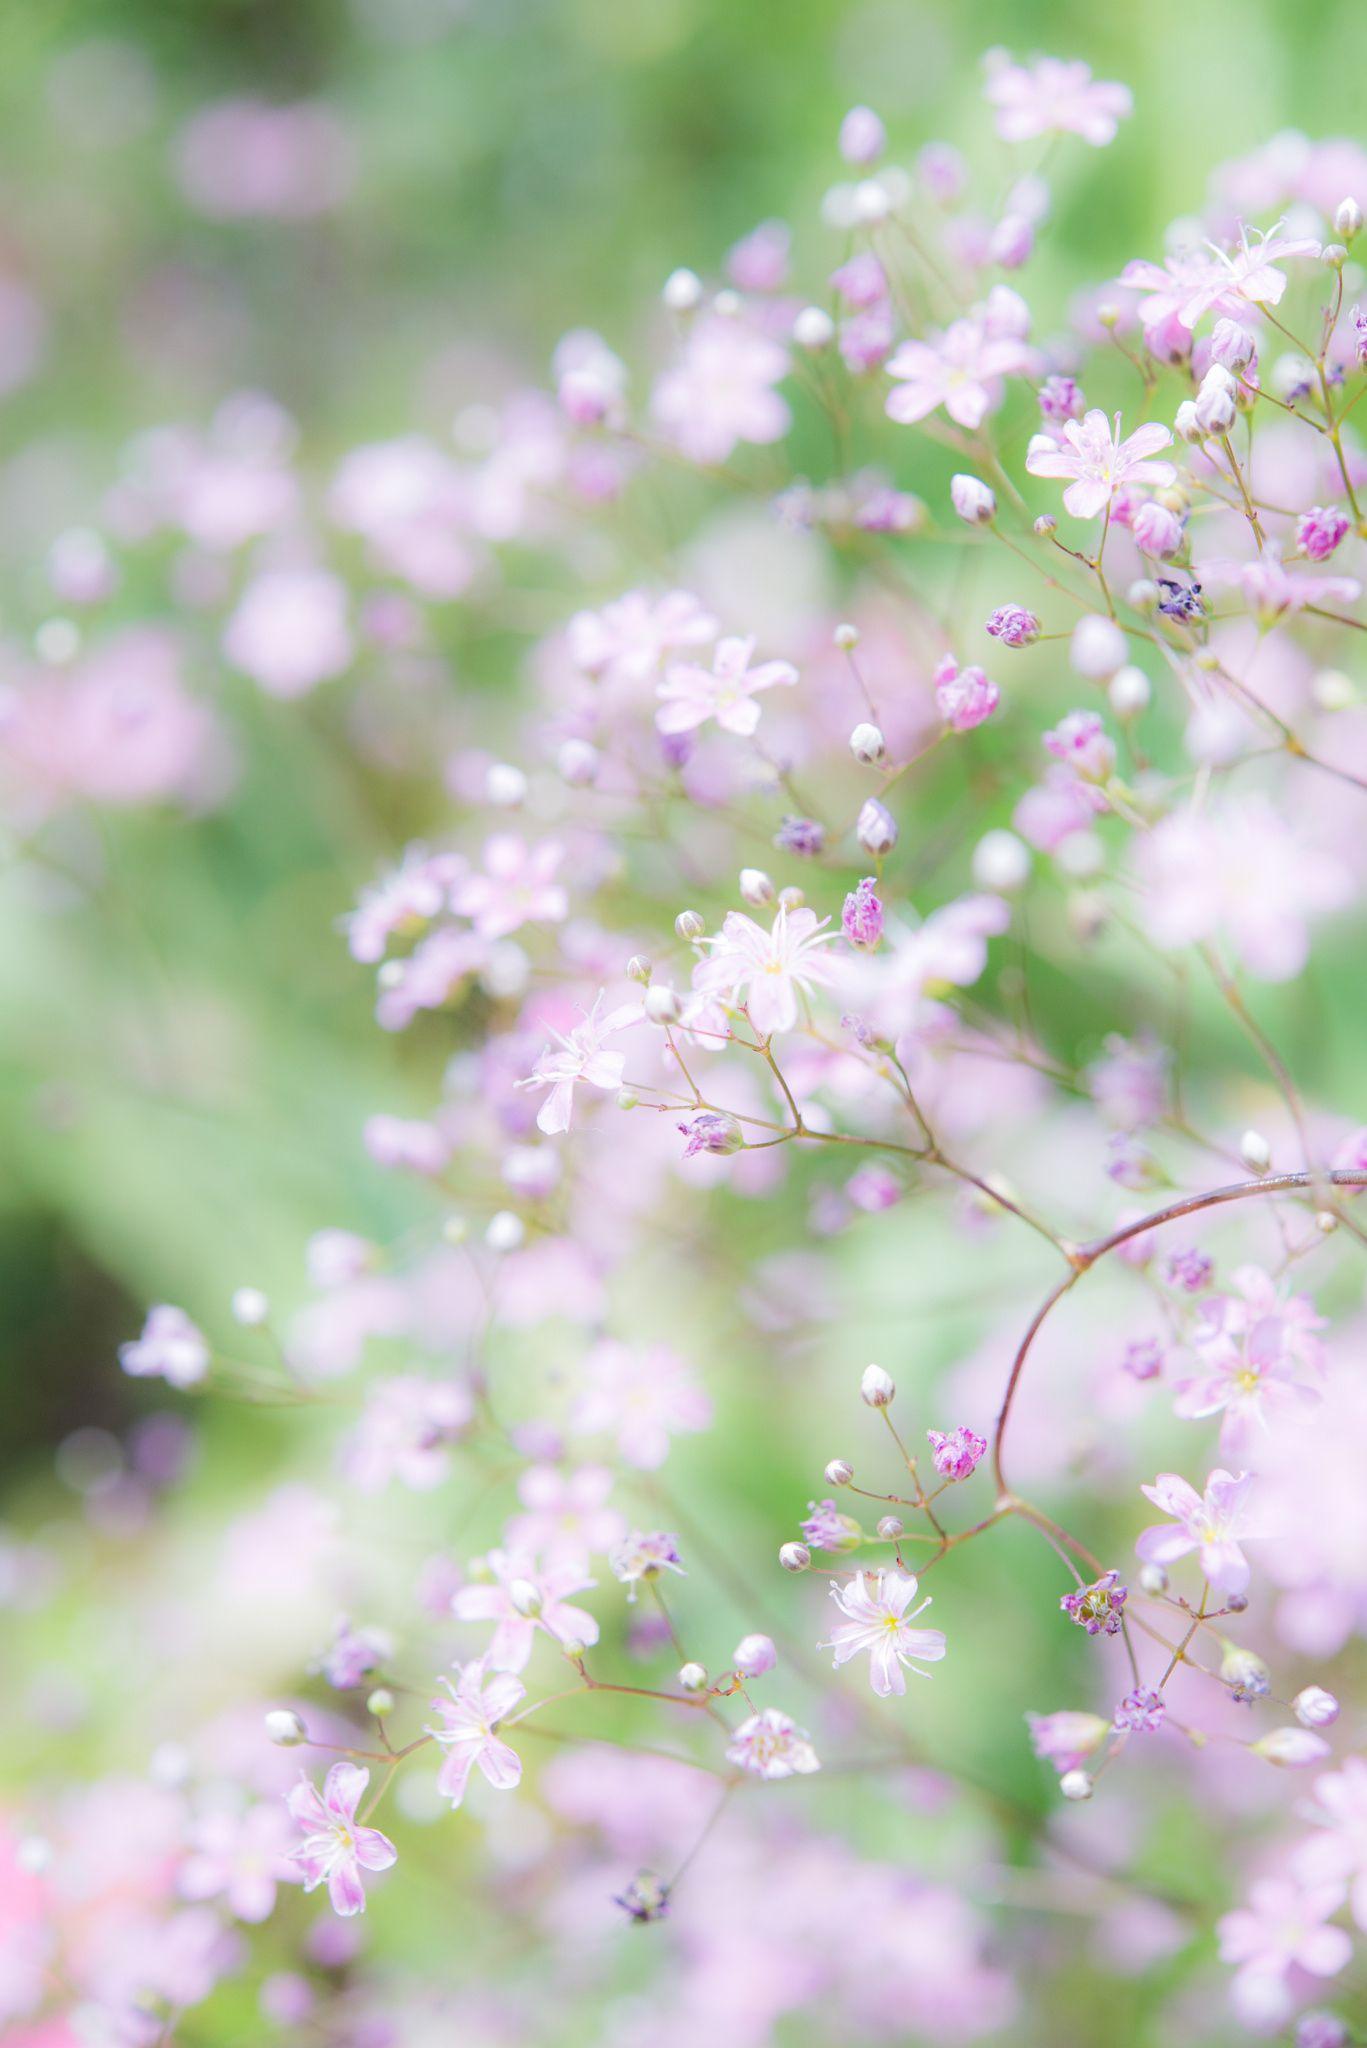 unas hermosas flores | naturales a y paisajes | Pinterest | Hermosas ...